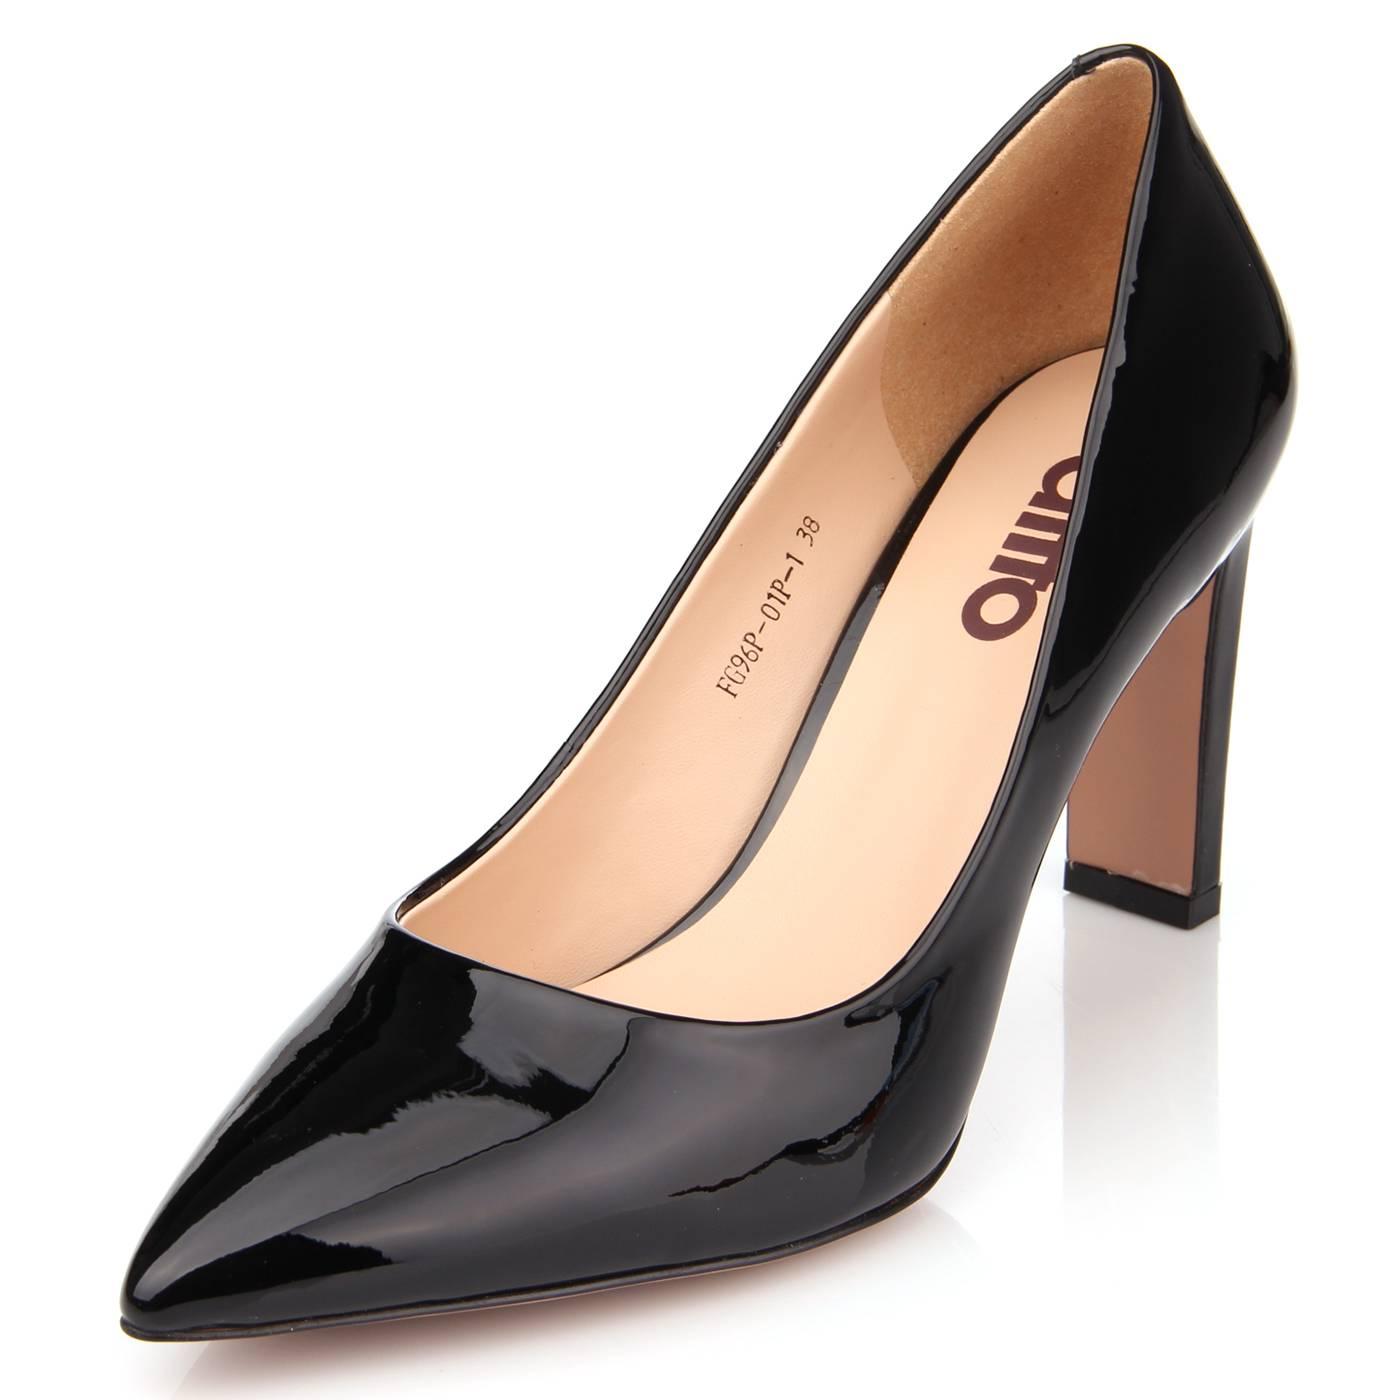 Туфлі жіночі ditto 6449 Чорний купить по выгодной цене в интернет ... b9190fa2d0073